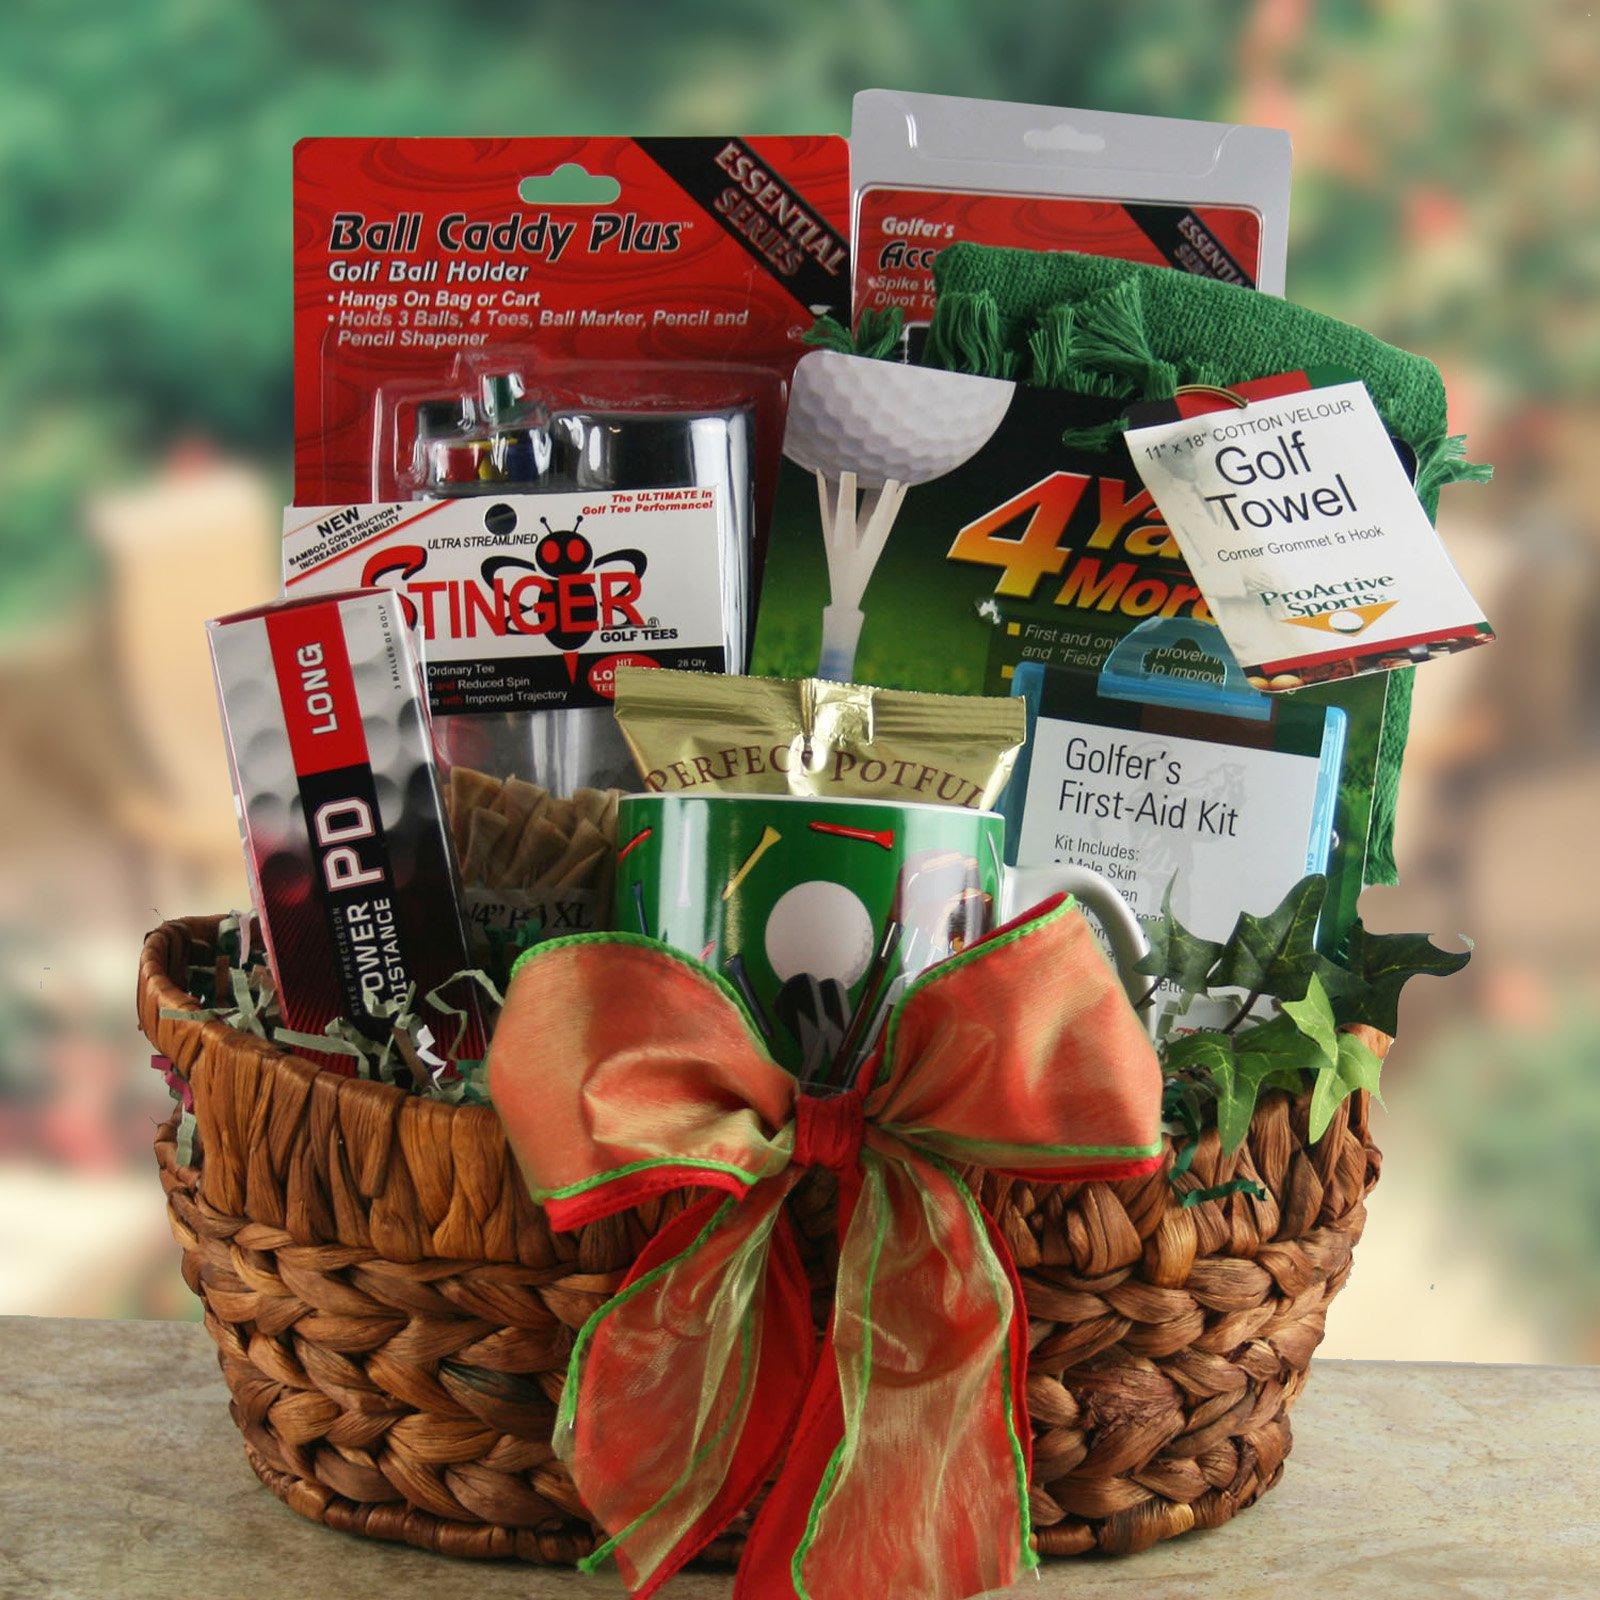 Birdies Gift Basket